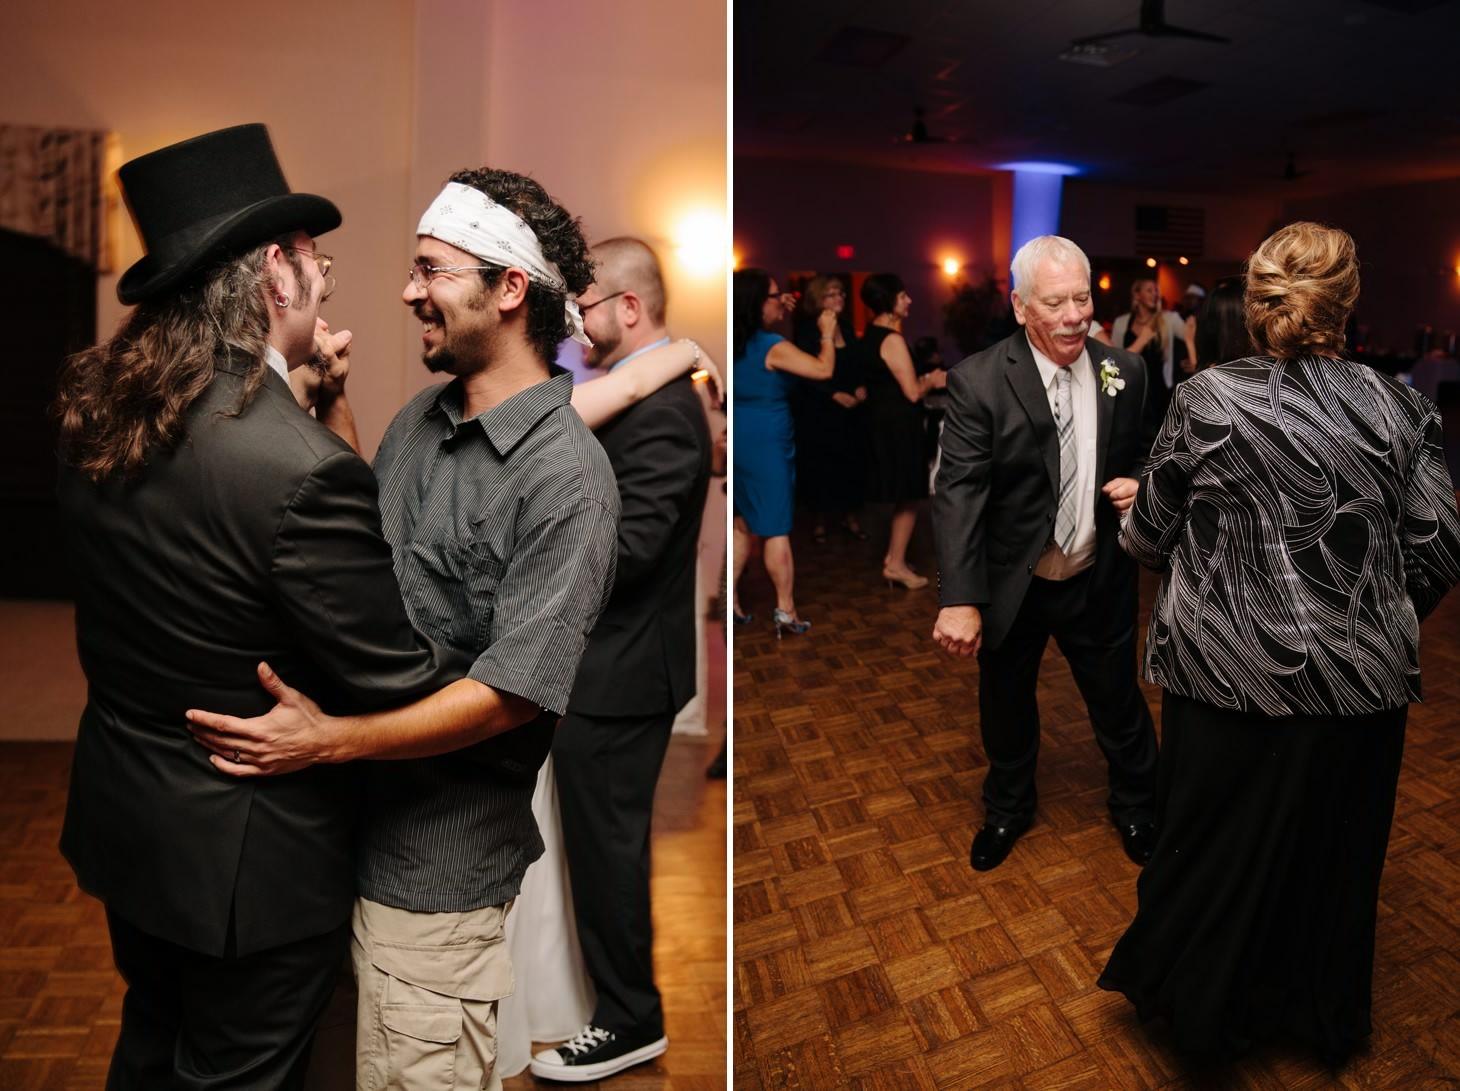 040-nyc-wedding-photographer-nj-nerdy-dr-who-firehouse-wedding-smitten-chickens.jpg